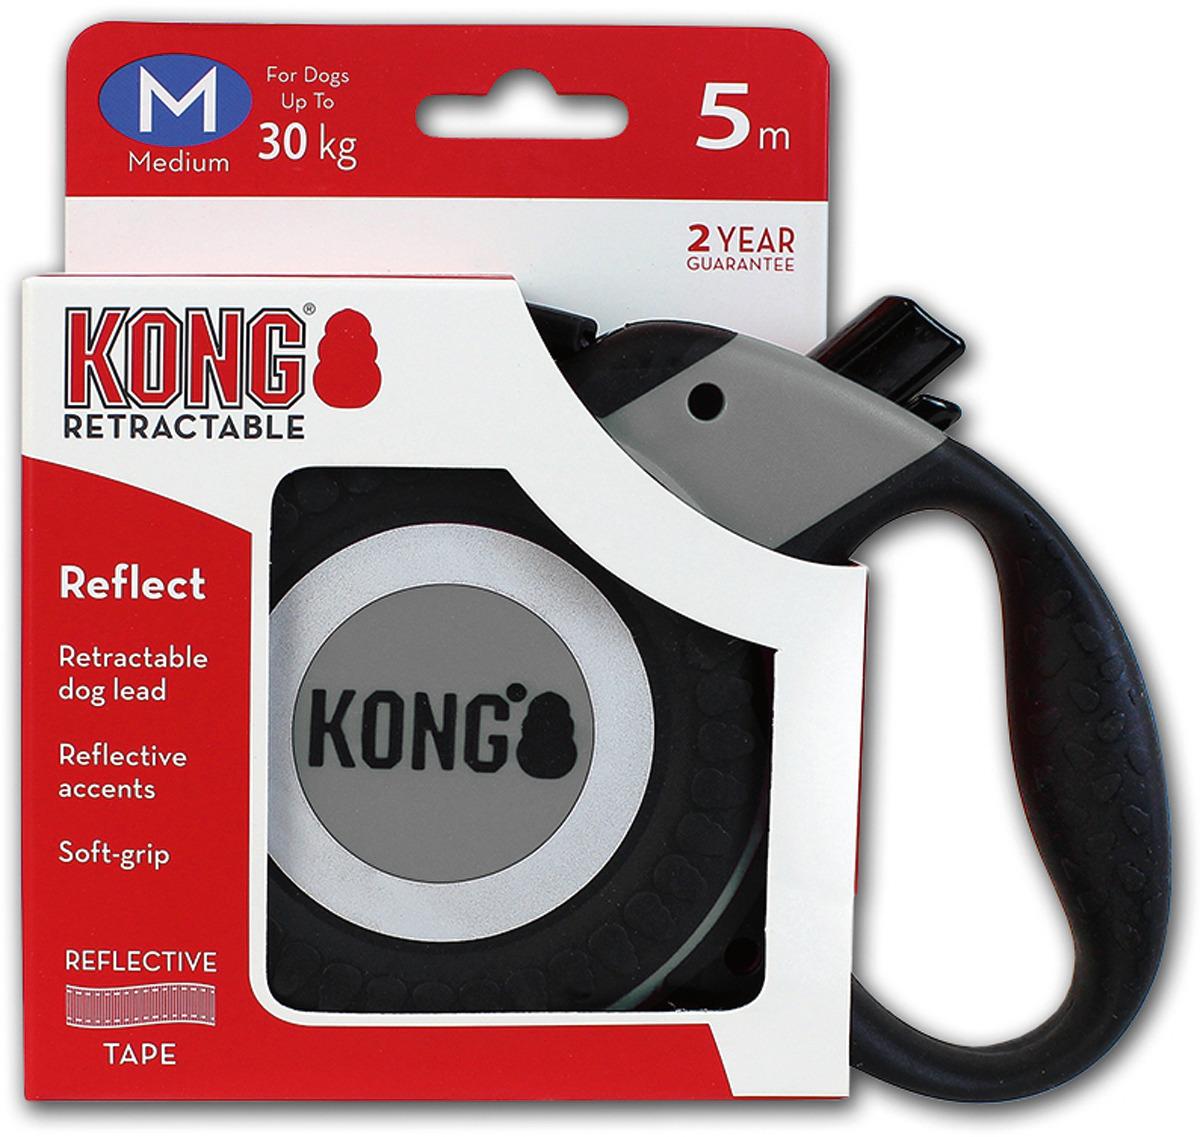 Поводок-рулетка для собак Kong Reflect M, цвет: серый, до 30 кг, 5 м